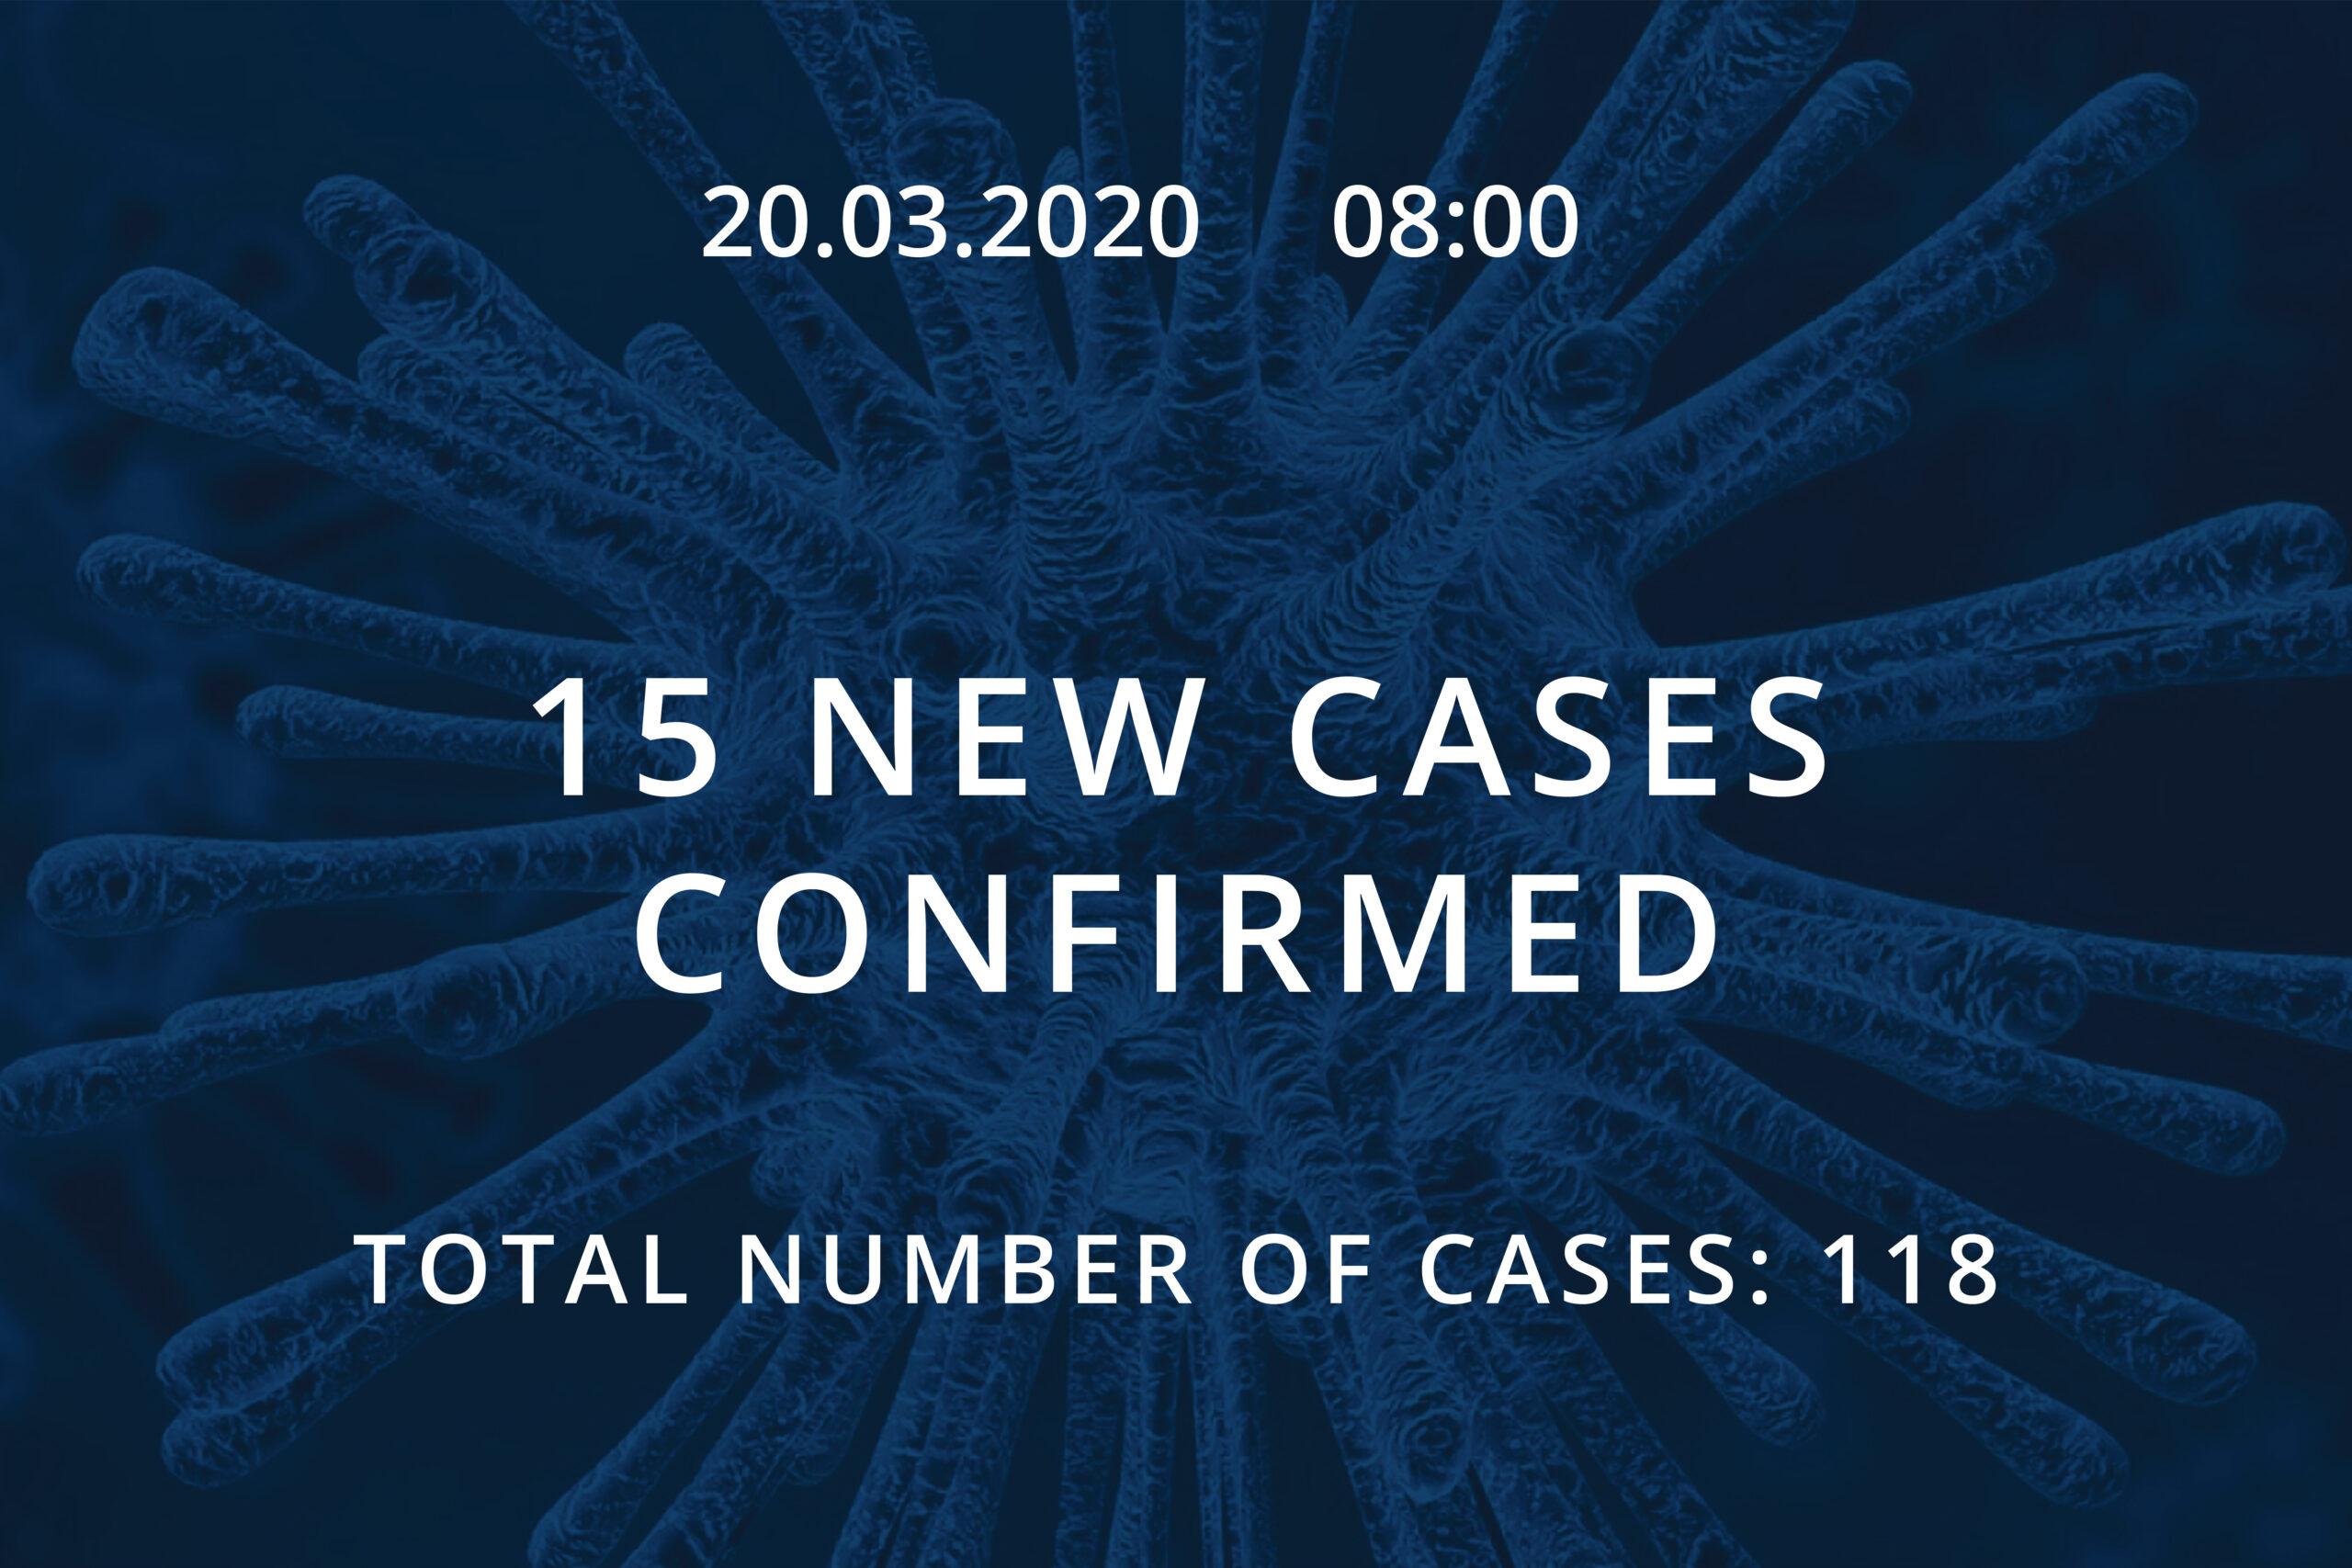 Information about coronavirus COVID-19, 20.03.2020 at 8:00